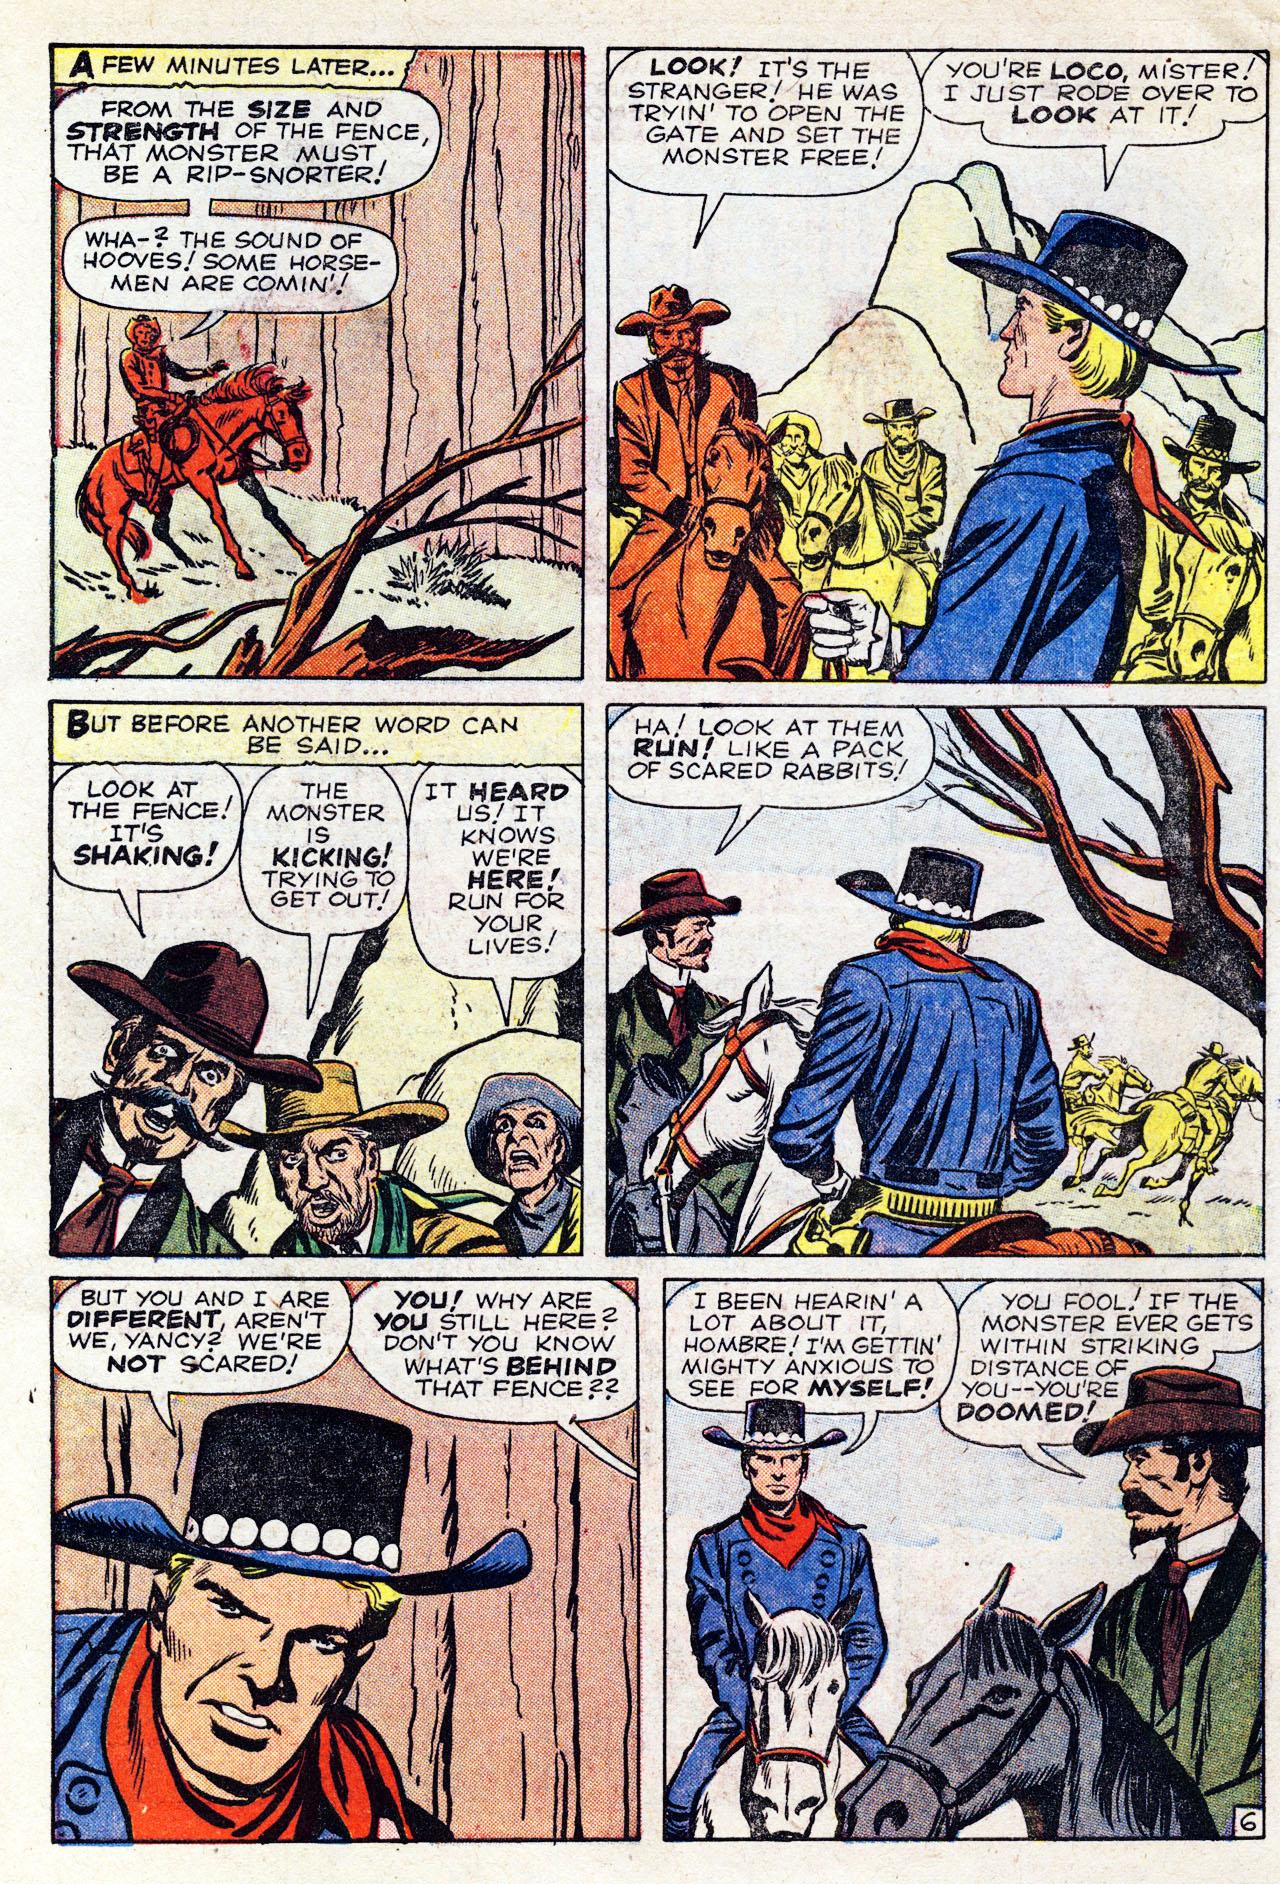 Read online Two-Gun Kid comic -  Issue #58 - 10